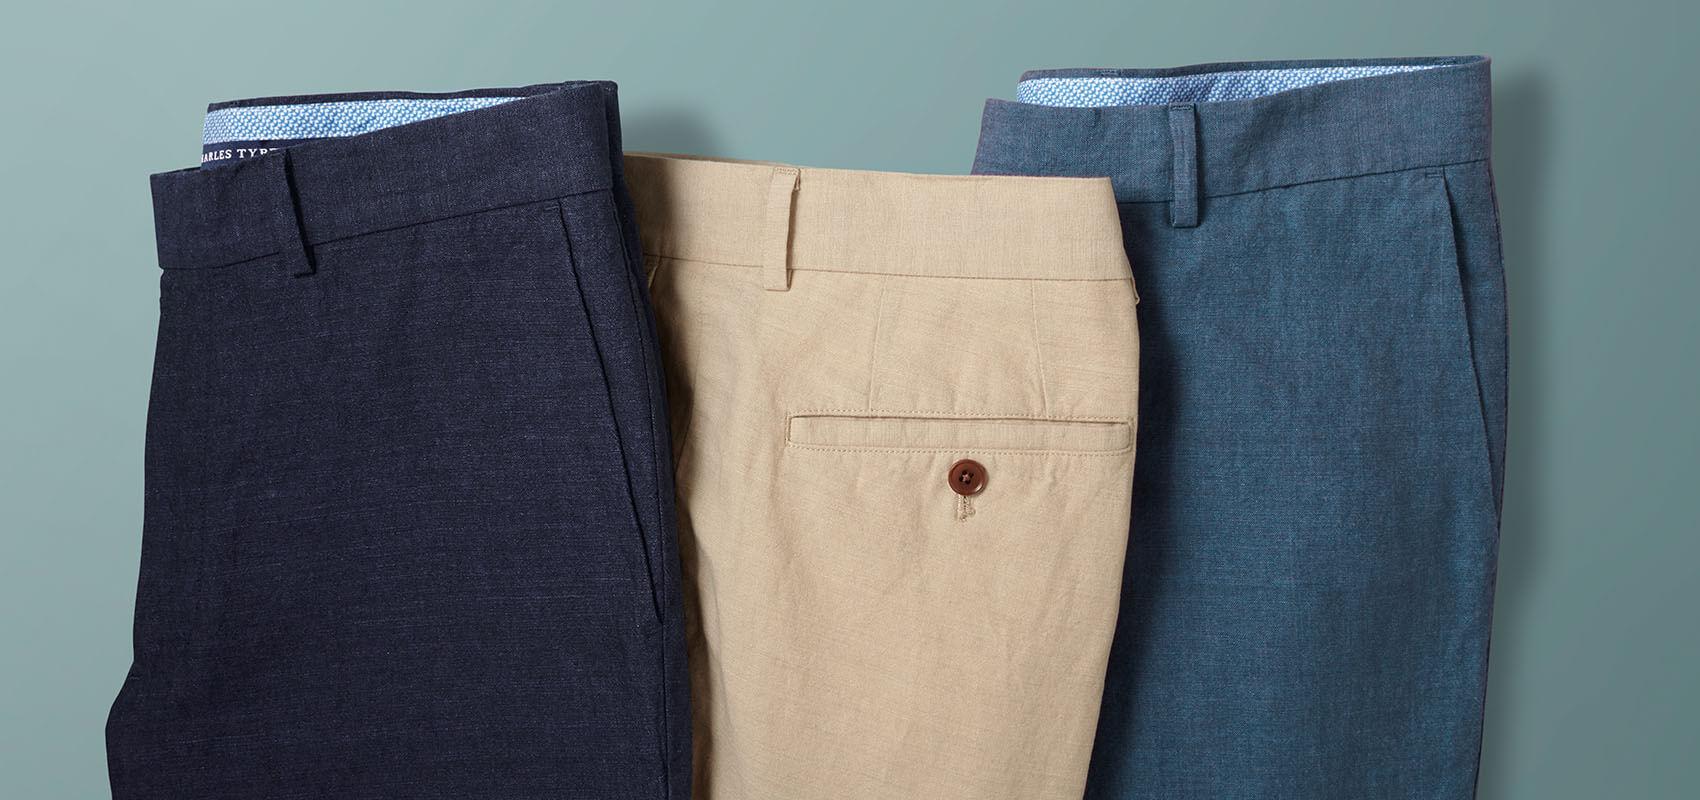 Charles Tyrwhitt casual trousers